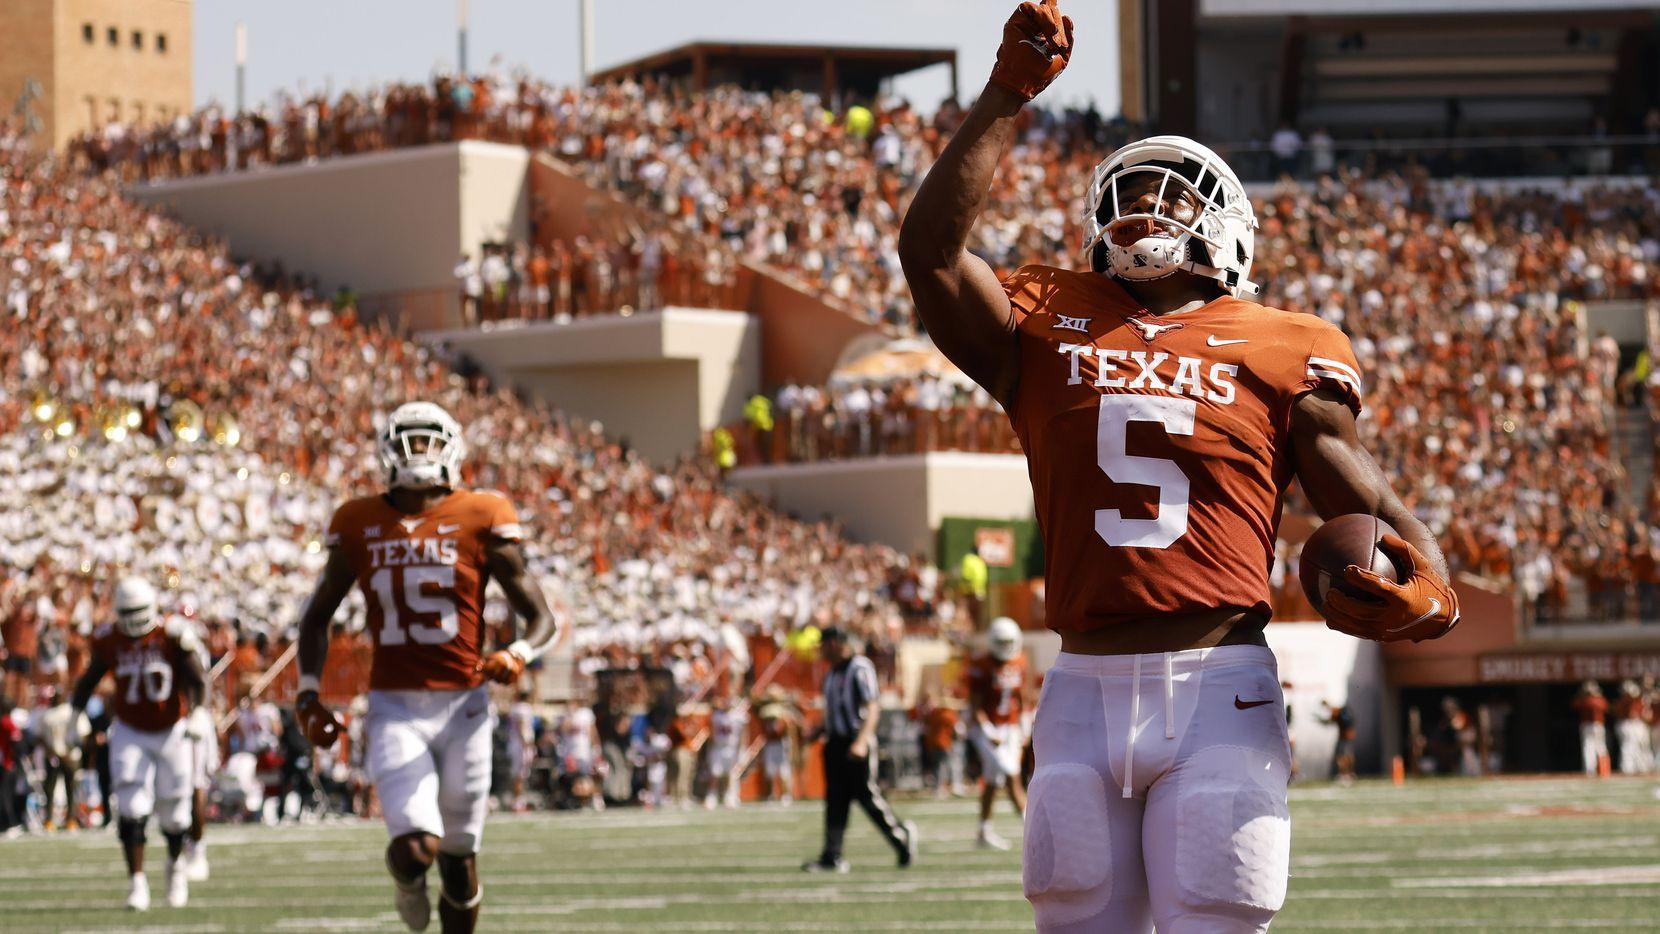 Texas Longhorns running back Bijan Robinson (5) points skyward after scoring a first quarter touchdown against the Louisiana-Lafayette Ragin Cajuns at DKR-Texas Memorial Stadium in Austin, Saturday, September 4, 2021. (Tom Fox/The Dallas Morning News)